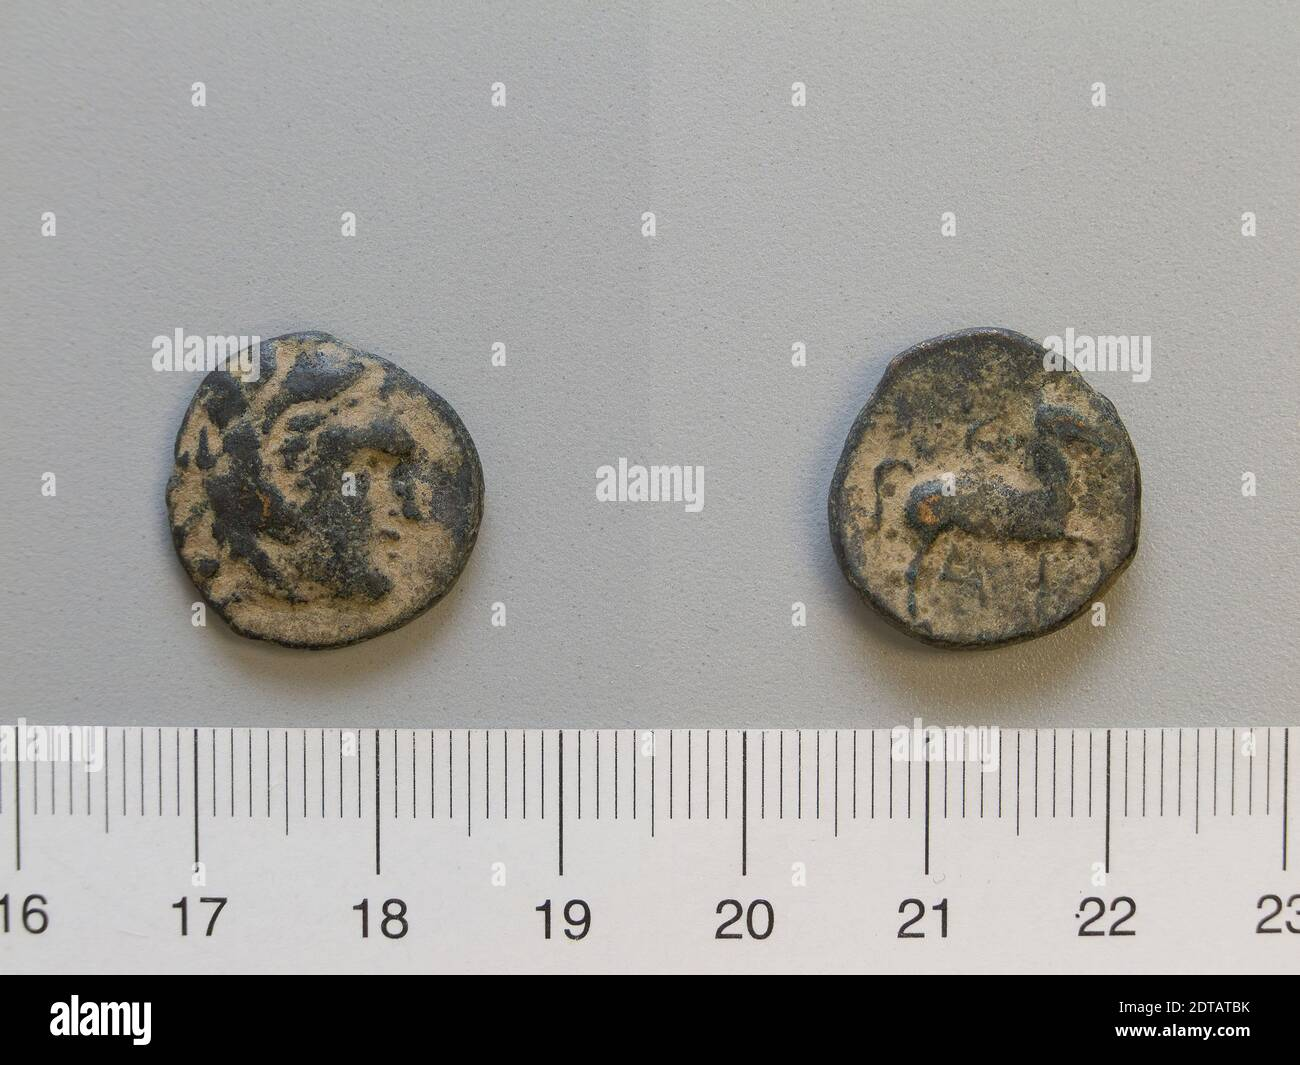 Regla: Cassander, Coin of Cassander, 306–297 a.C., Bronce, 3.87 g, 2:00, 17.5 mm, hecho en Macedonia, griego, siglo IV–3 a.C., Numismática Foto de stock